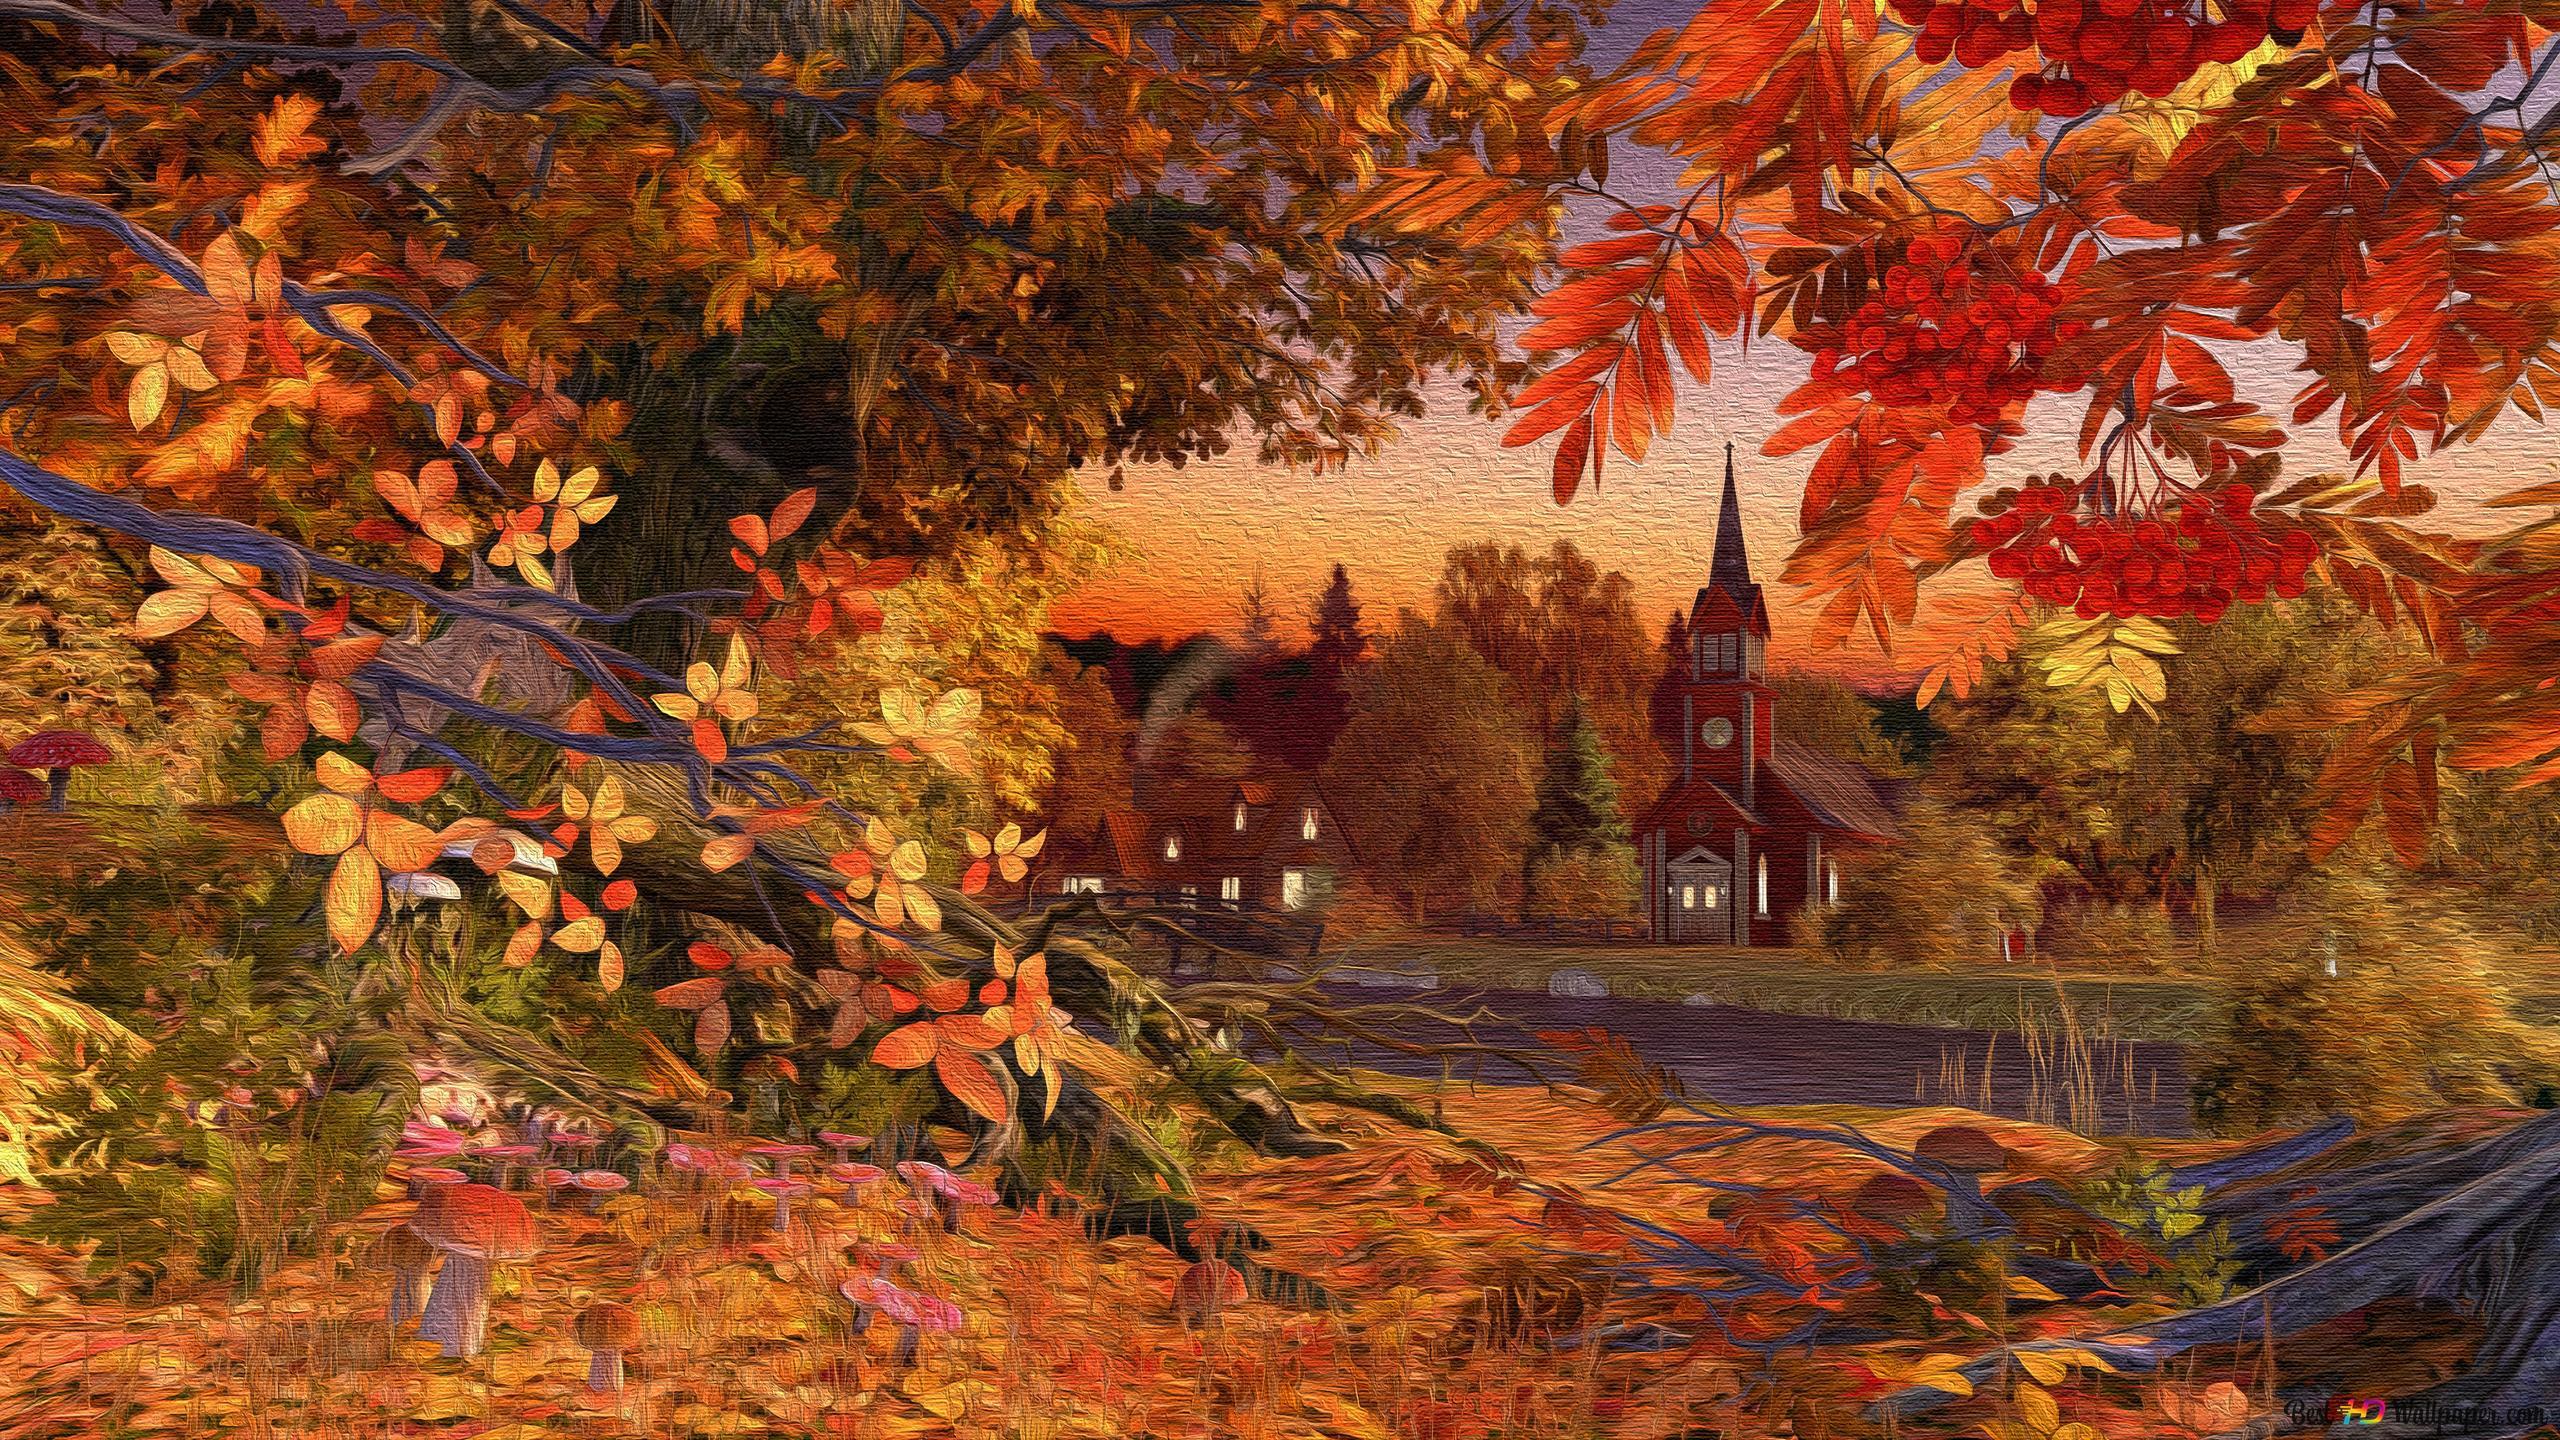 Autumn Hd Wallpaper Download